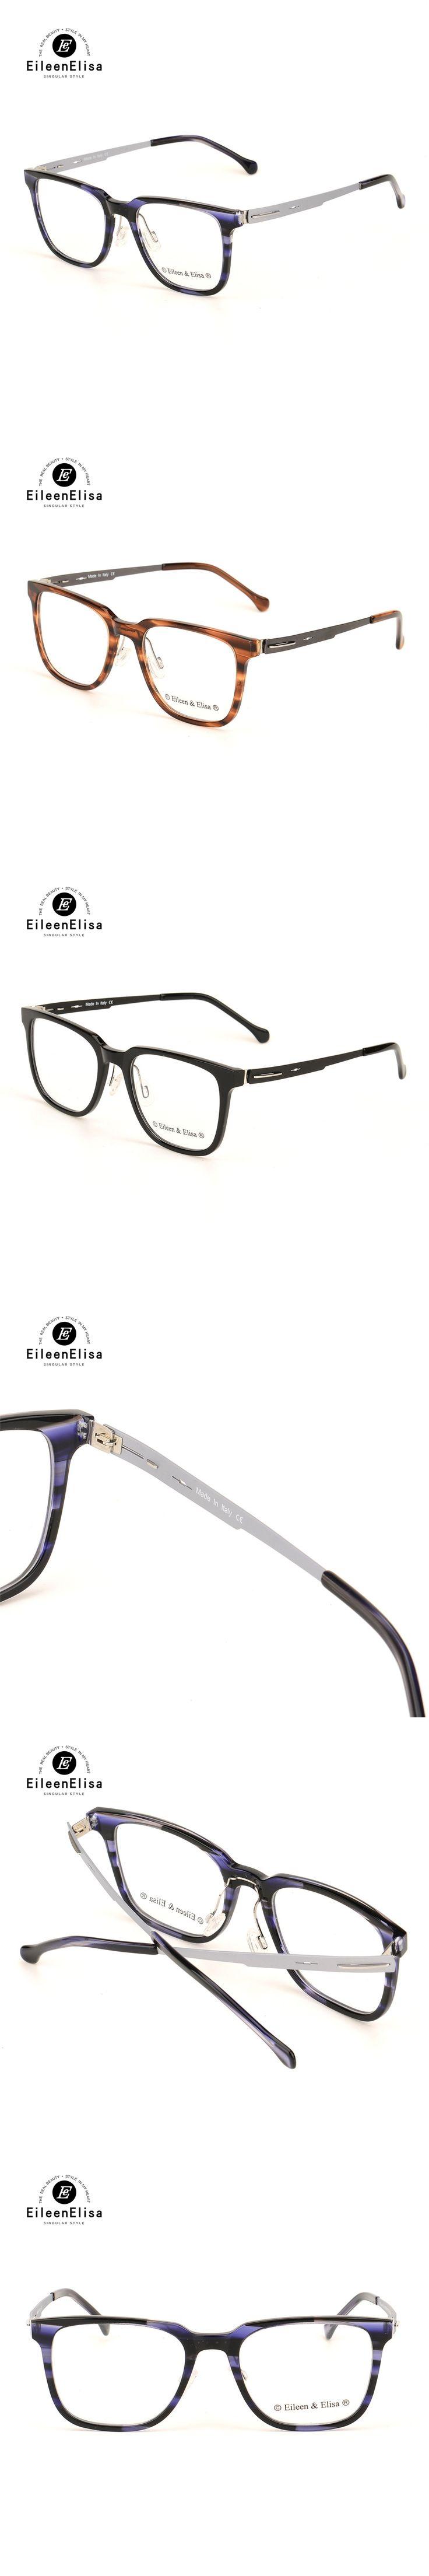 EE Hot Fashion Acetate Glasses Frame Men Optical Glasses With Clear Glass Transparent Glasses Women's Eyeglasses